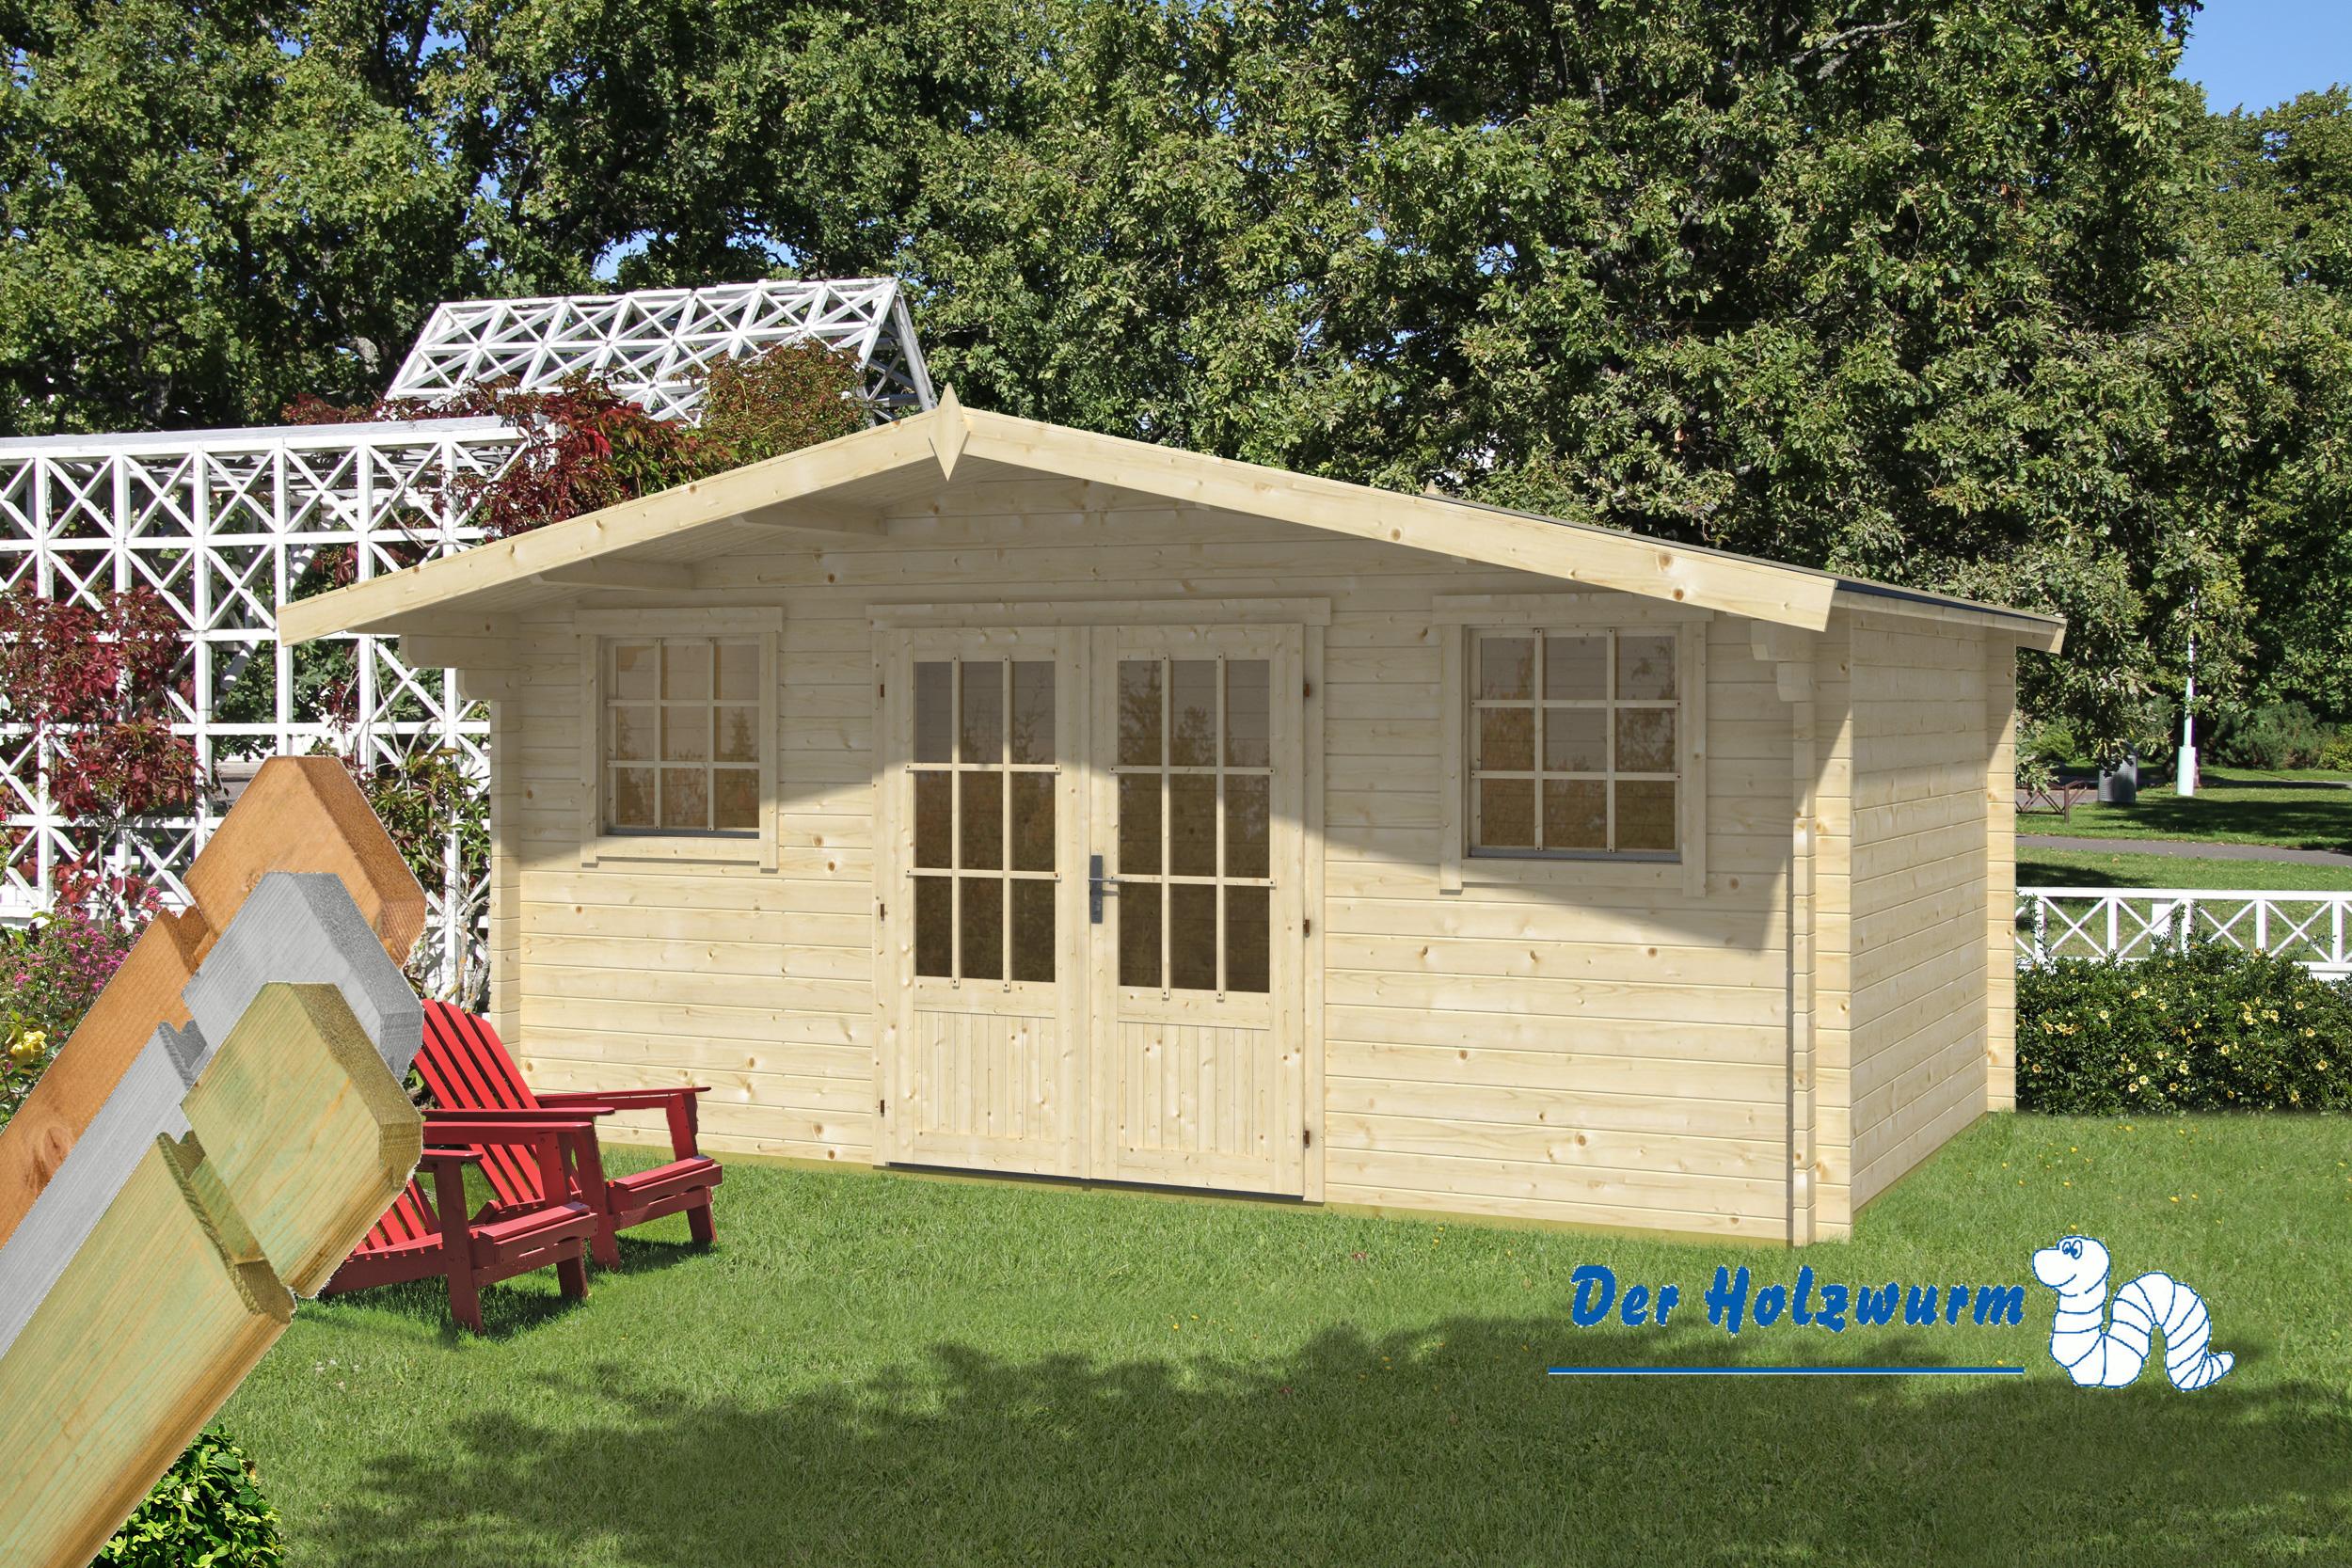 gartenhaus karen 40 mm ca 500x320 cm holzwurm obersayn. Black Bedroom Furniture Sets. Home Design Ideas